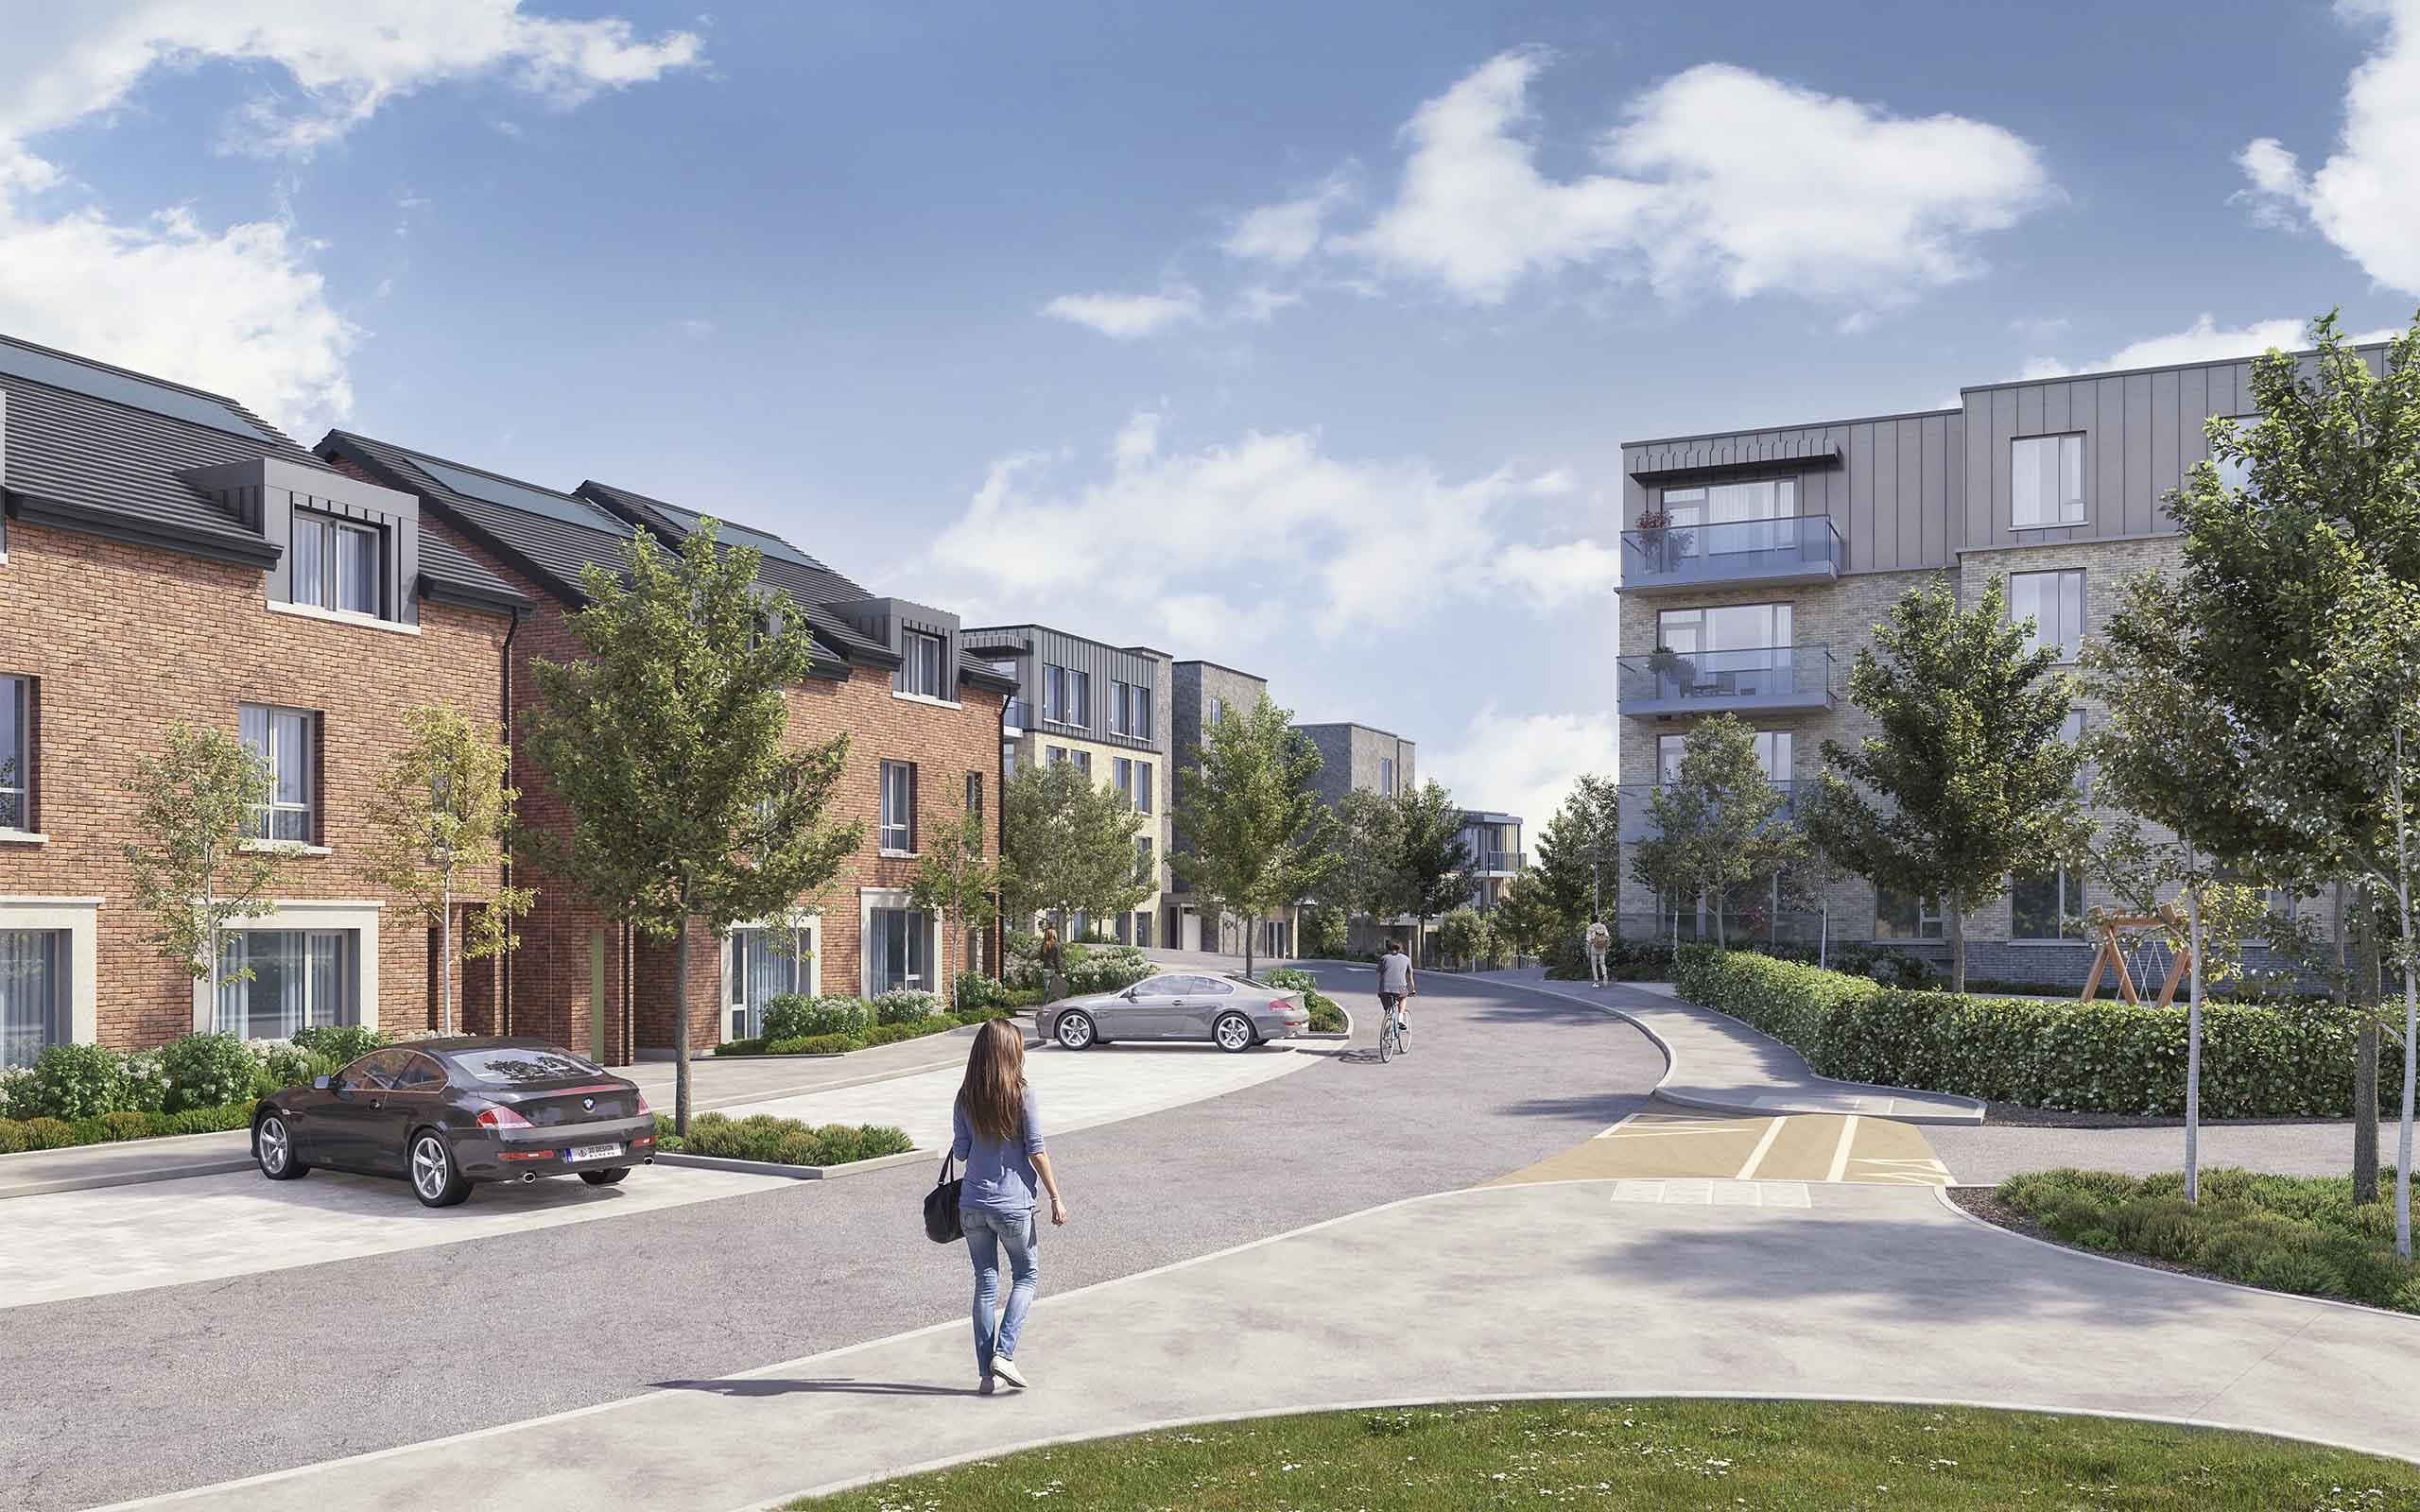 Architectural CGI of Kiltiernan SHD, Glenamuck Road, South Dublin.